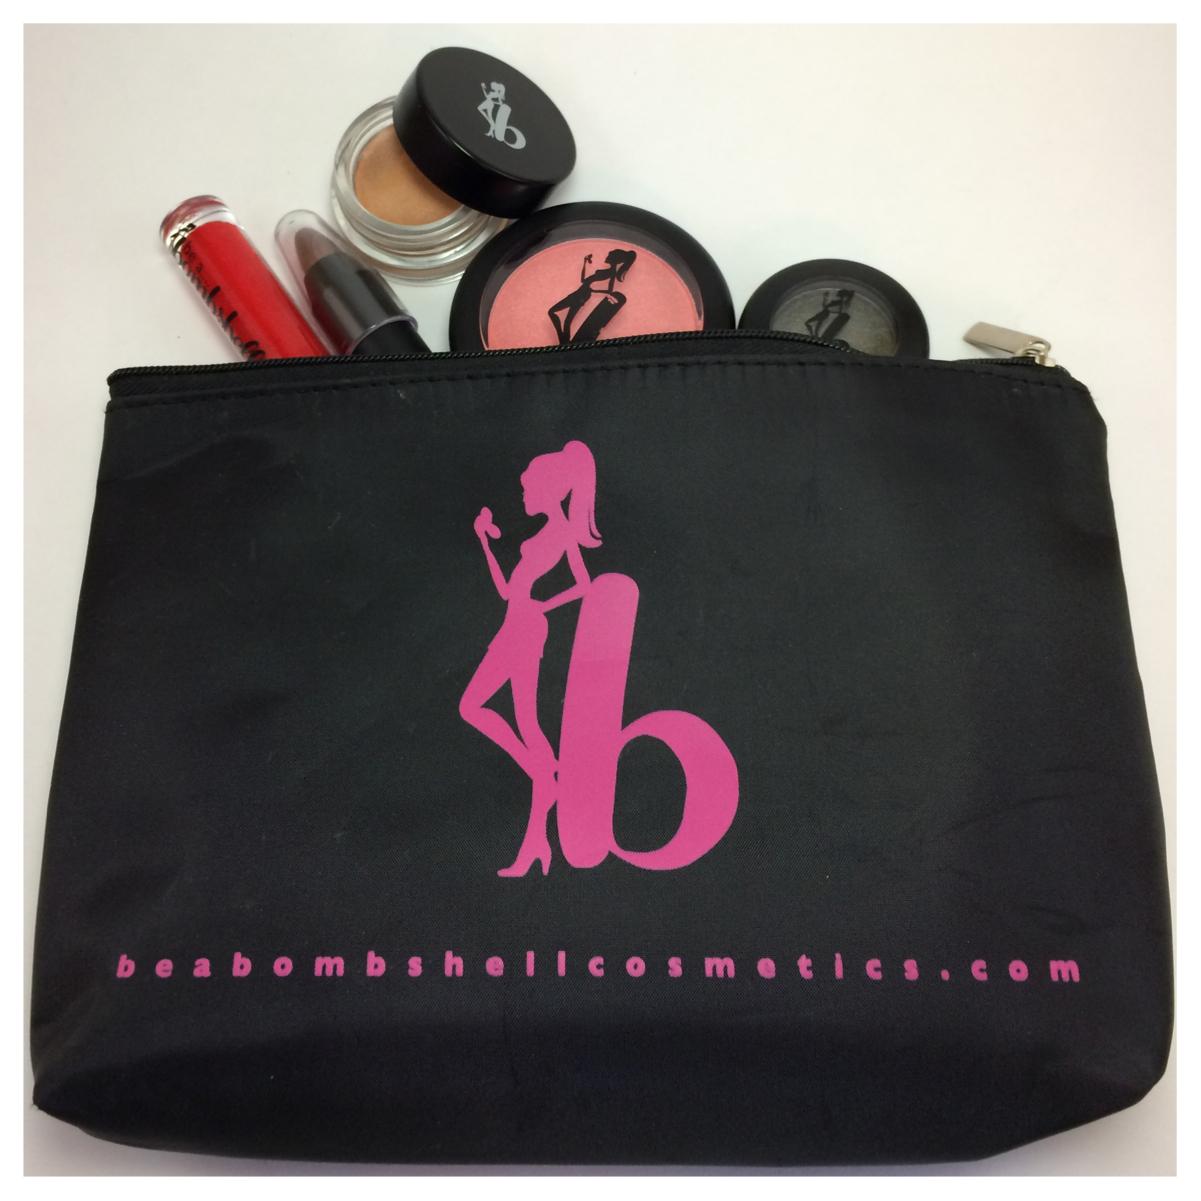 Be A Bombshell Cosmetics